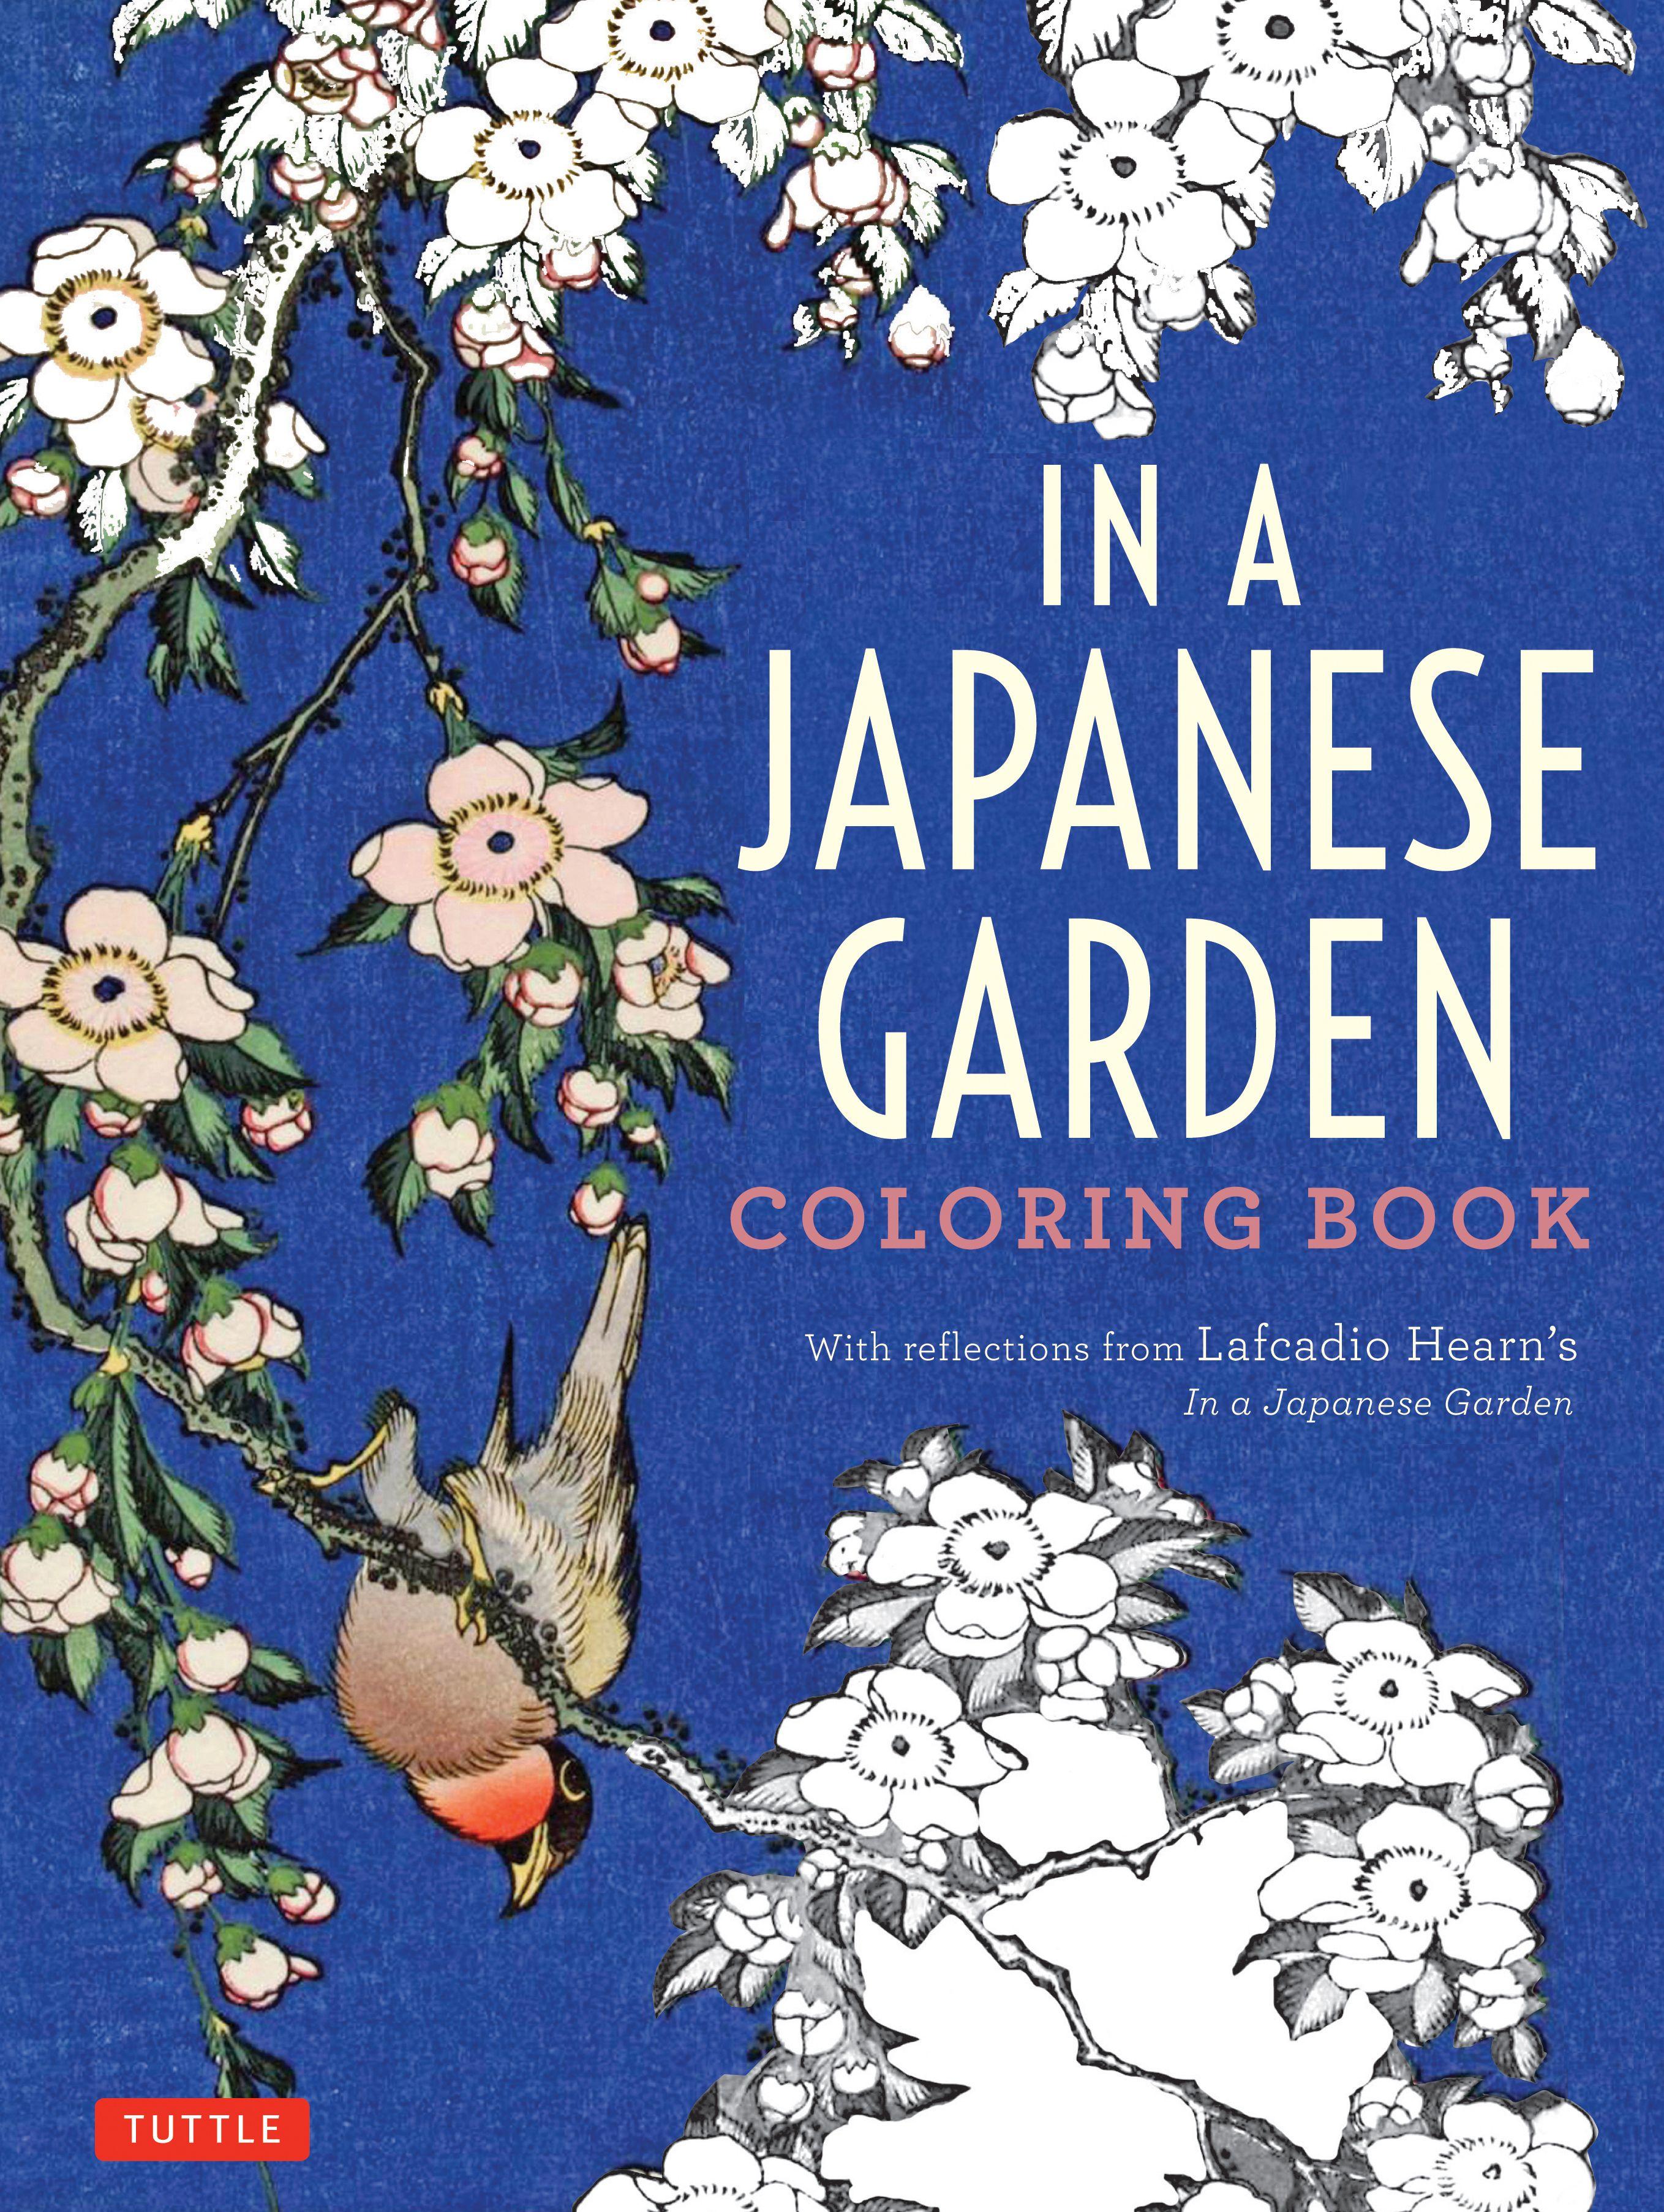 In A Japanese Garden Coloring Book Coloring Books Japanese Garden Gardens Coloring Book